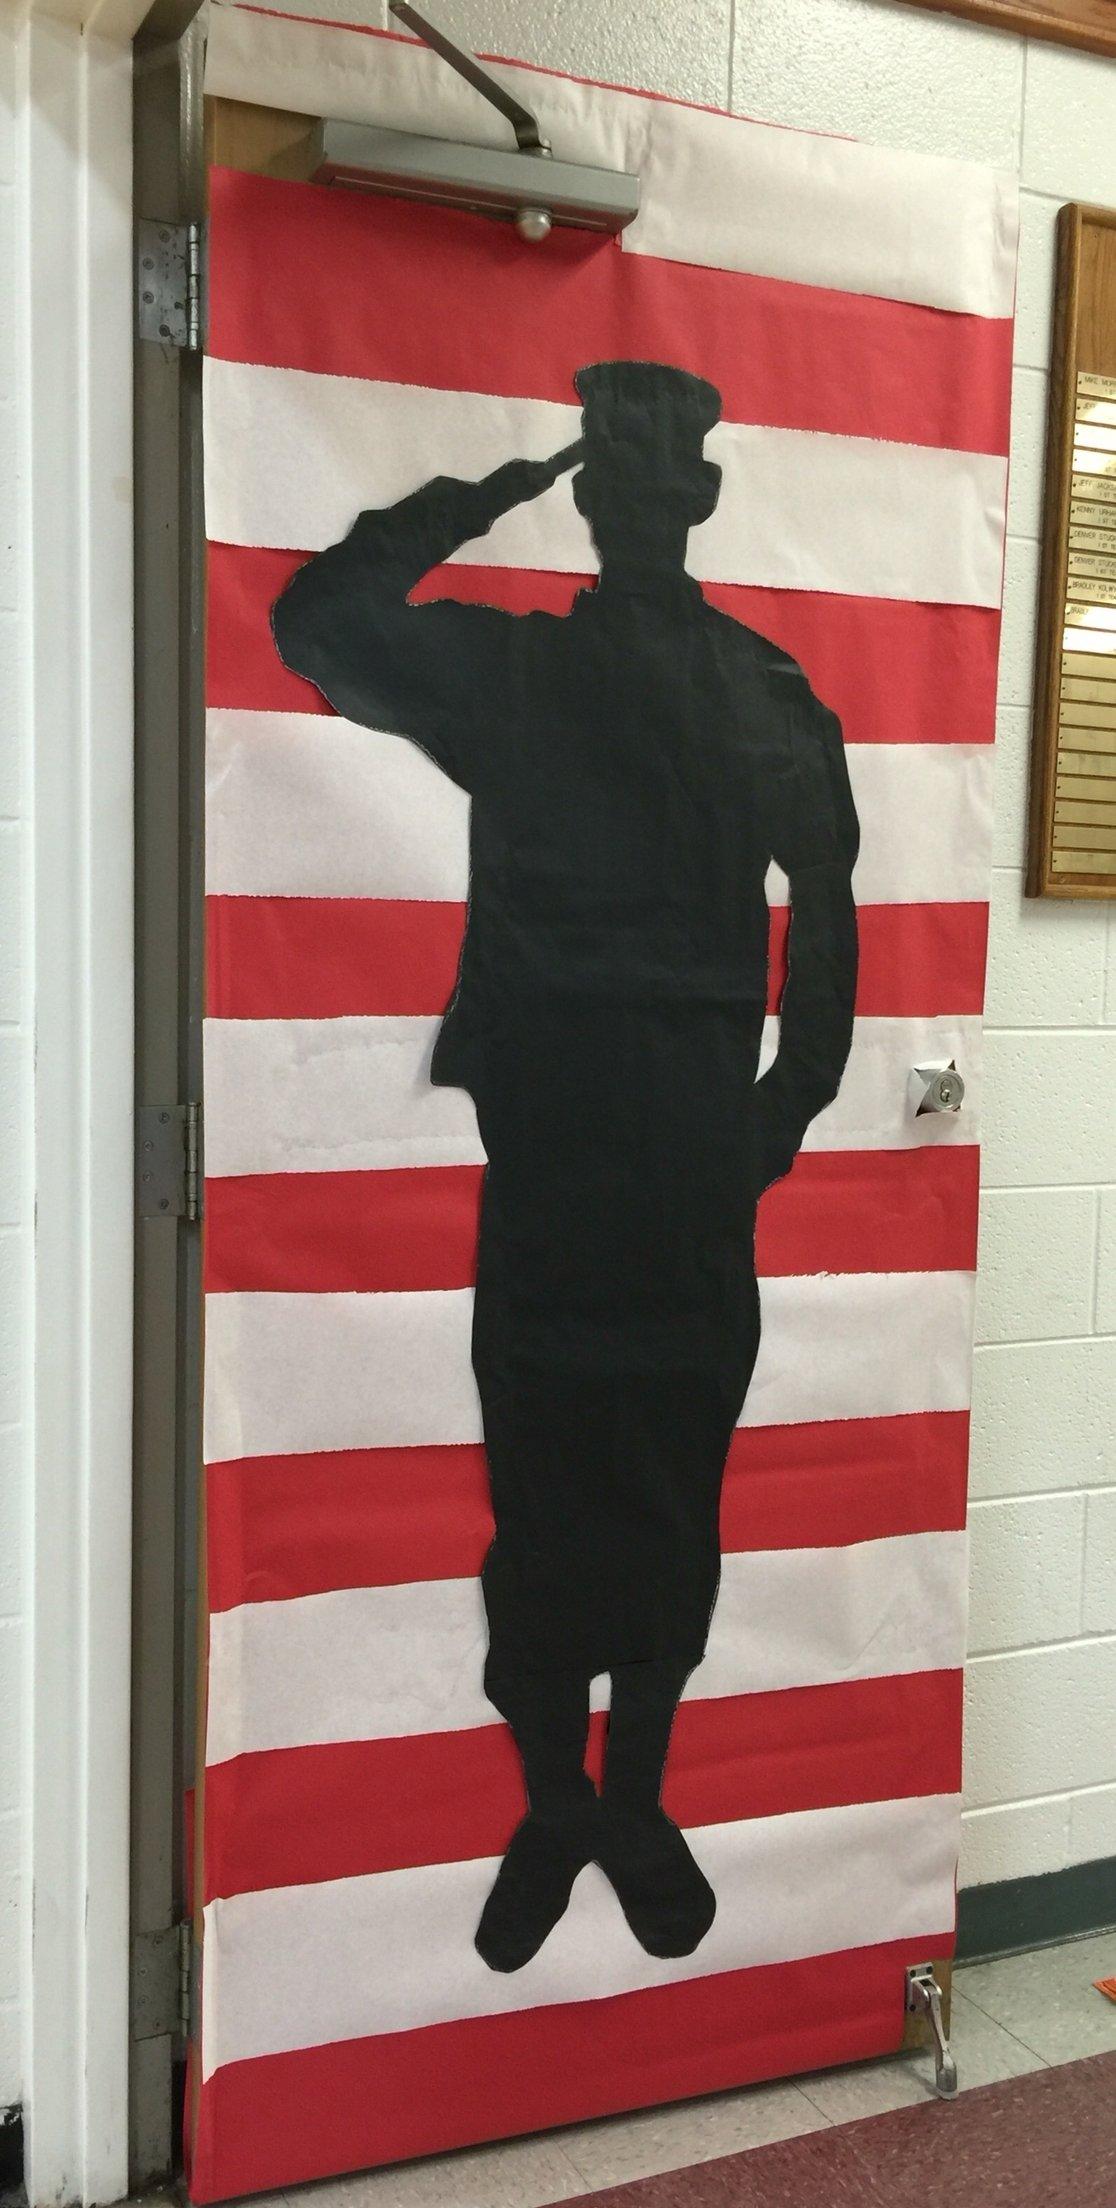 10 Lovely Veterans Day Bulletin Board Ideas veterans day decorations bulletin boards pinterest decoration 2020